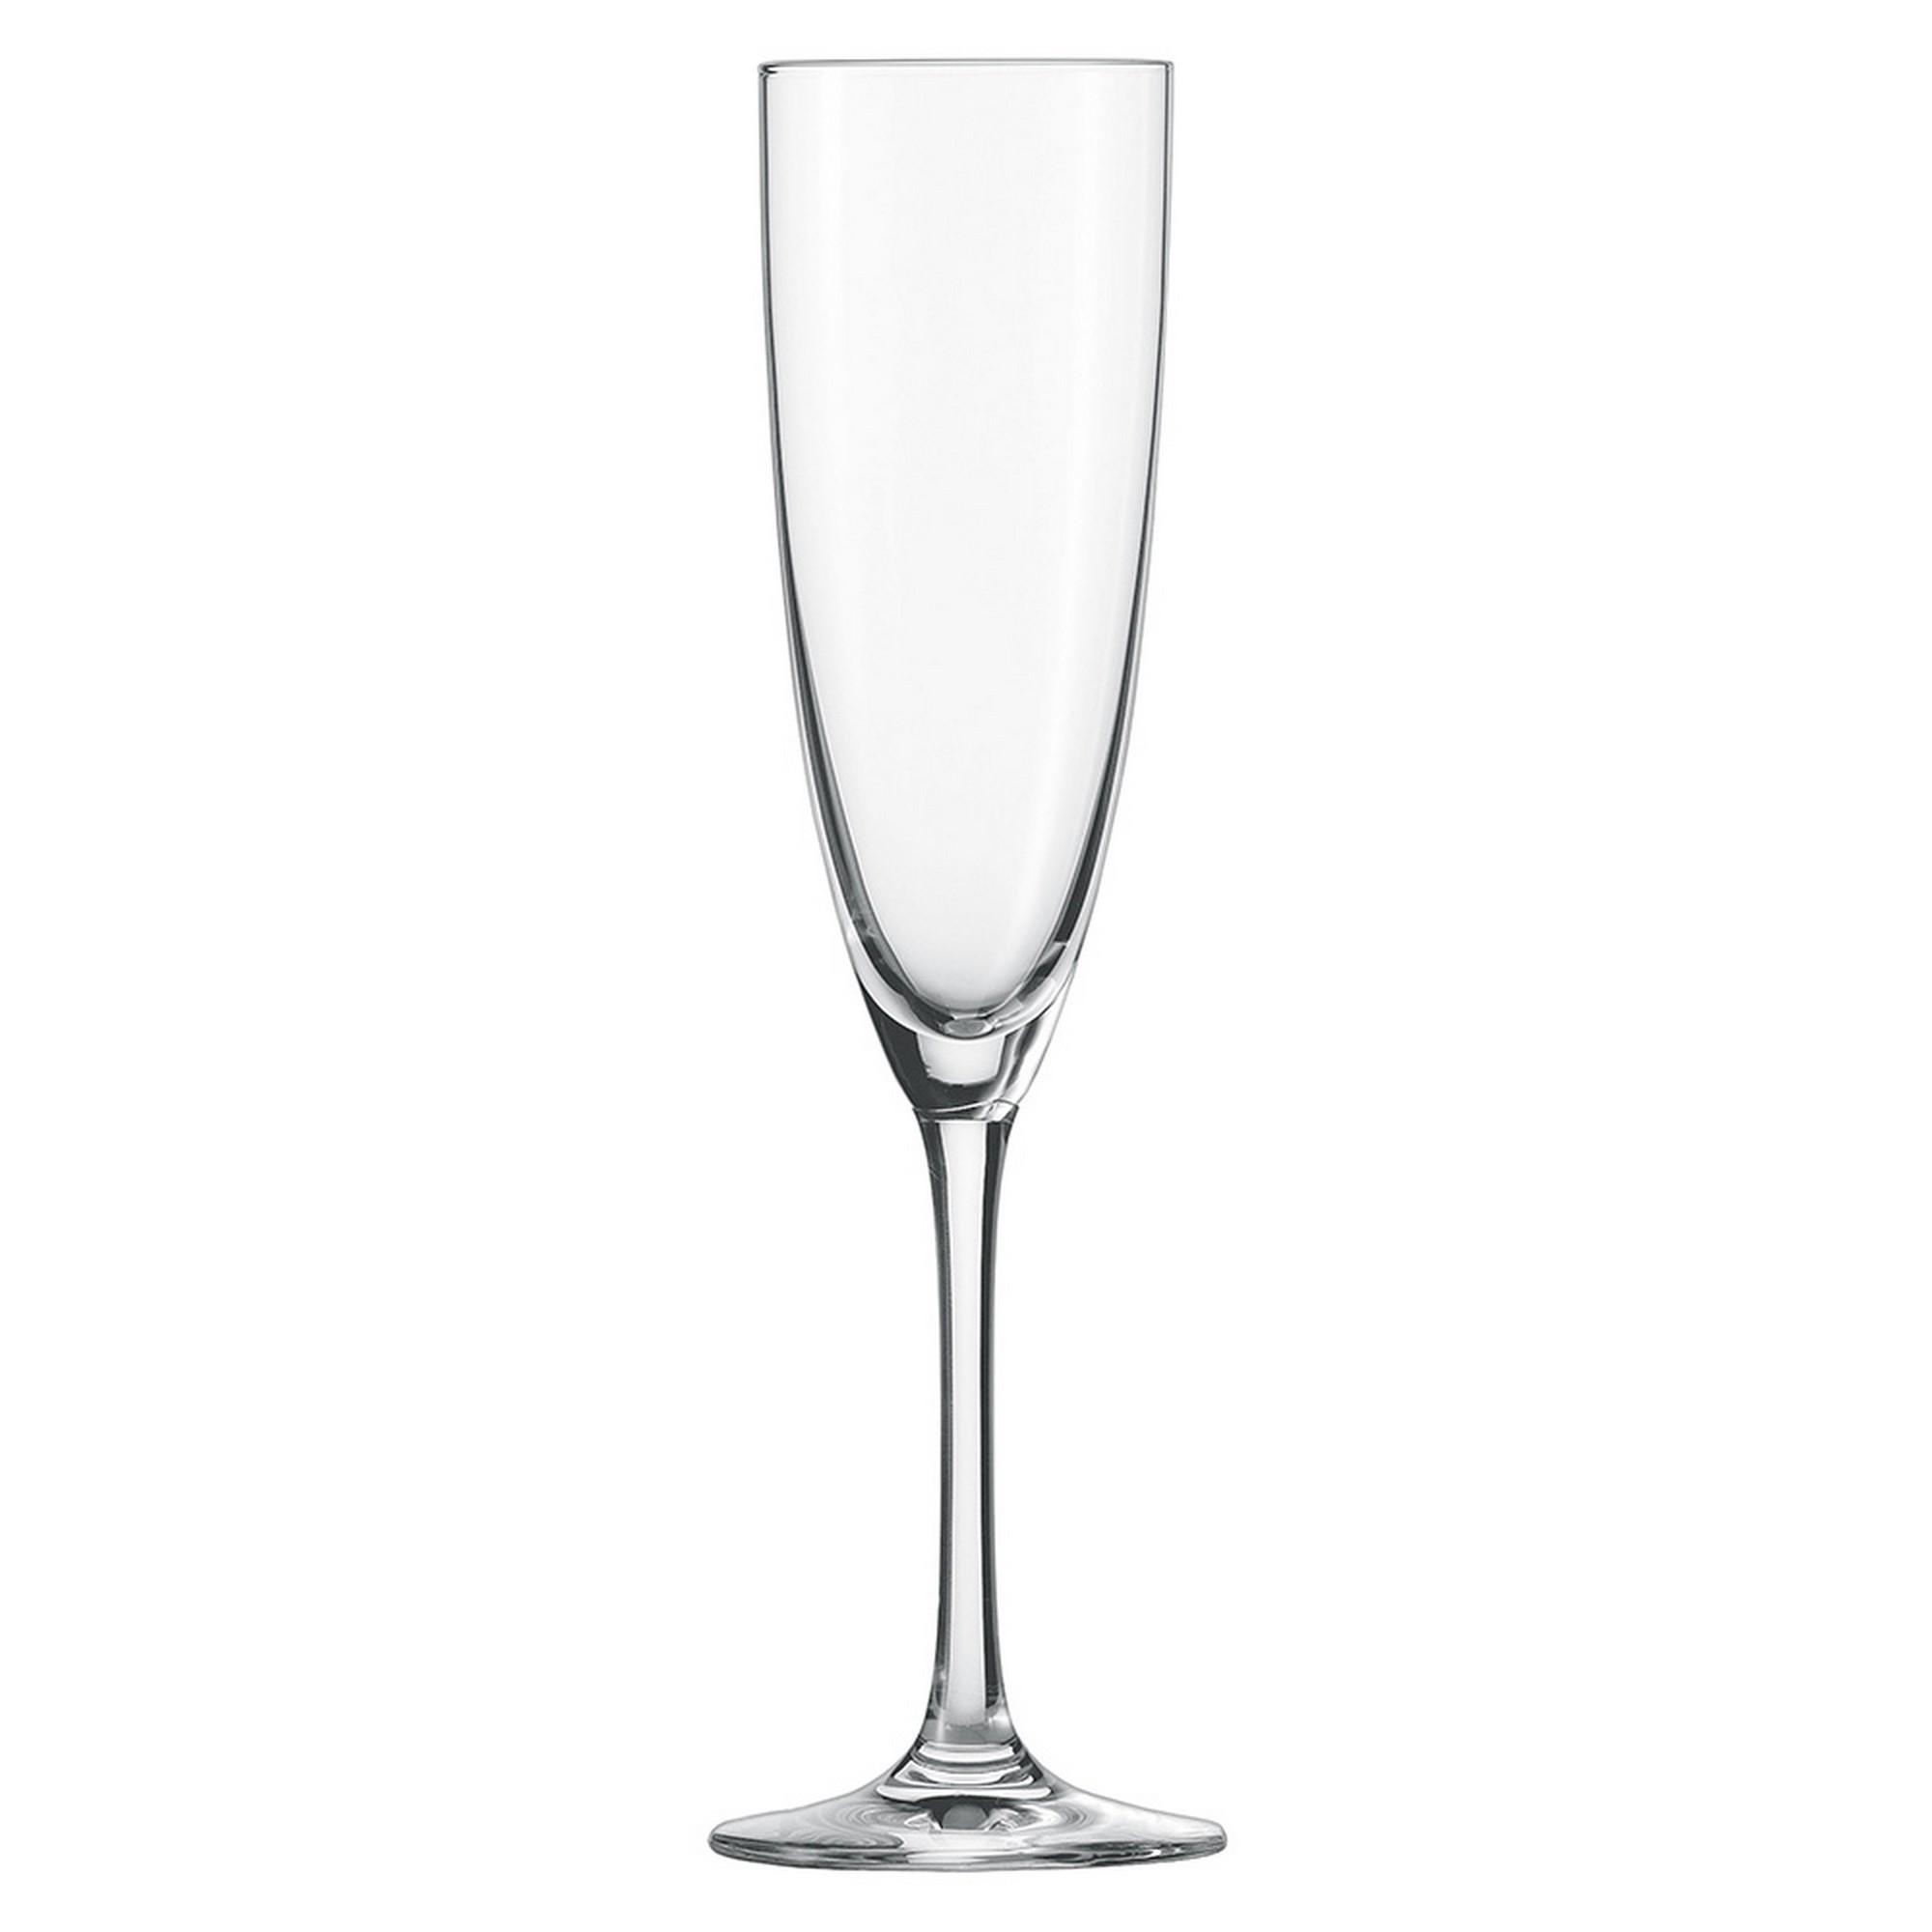 Taça para Champagne 210ml Schott Zwiesel Classico 6 Peças de Cristal